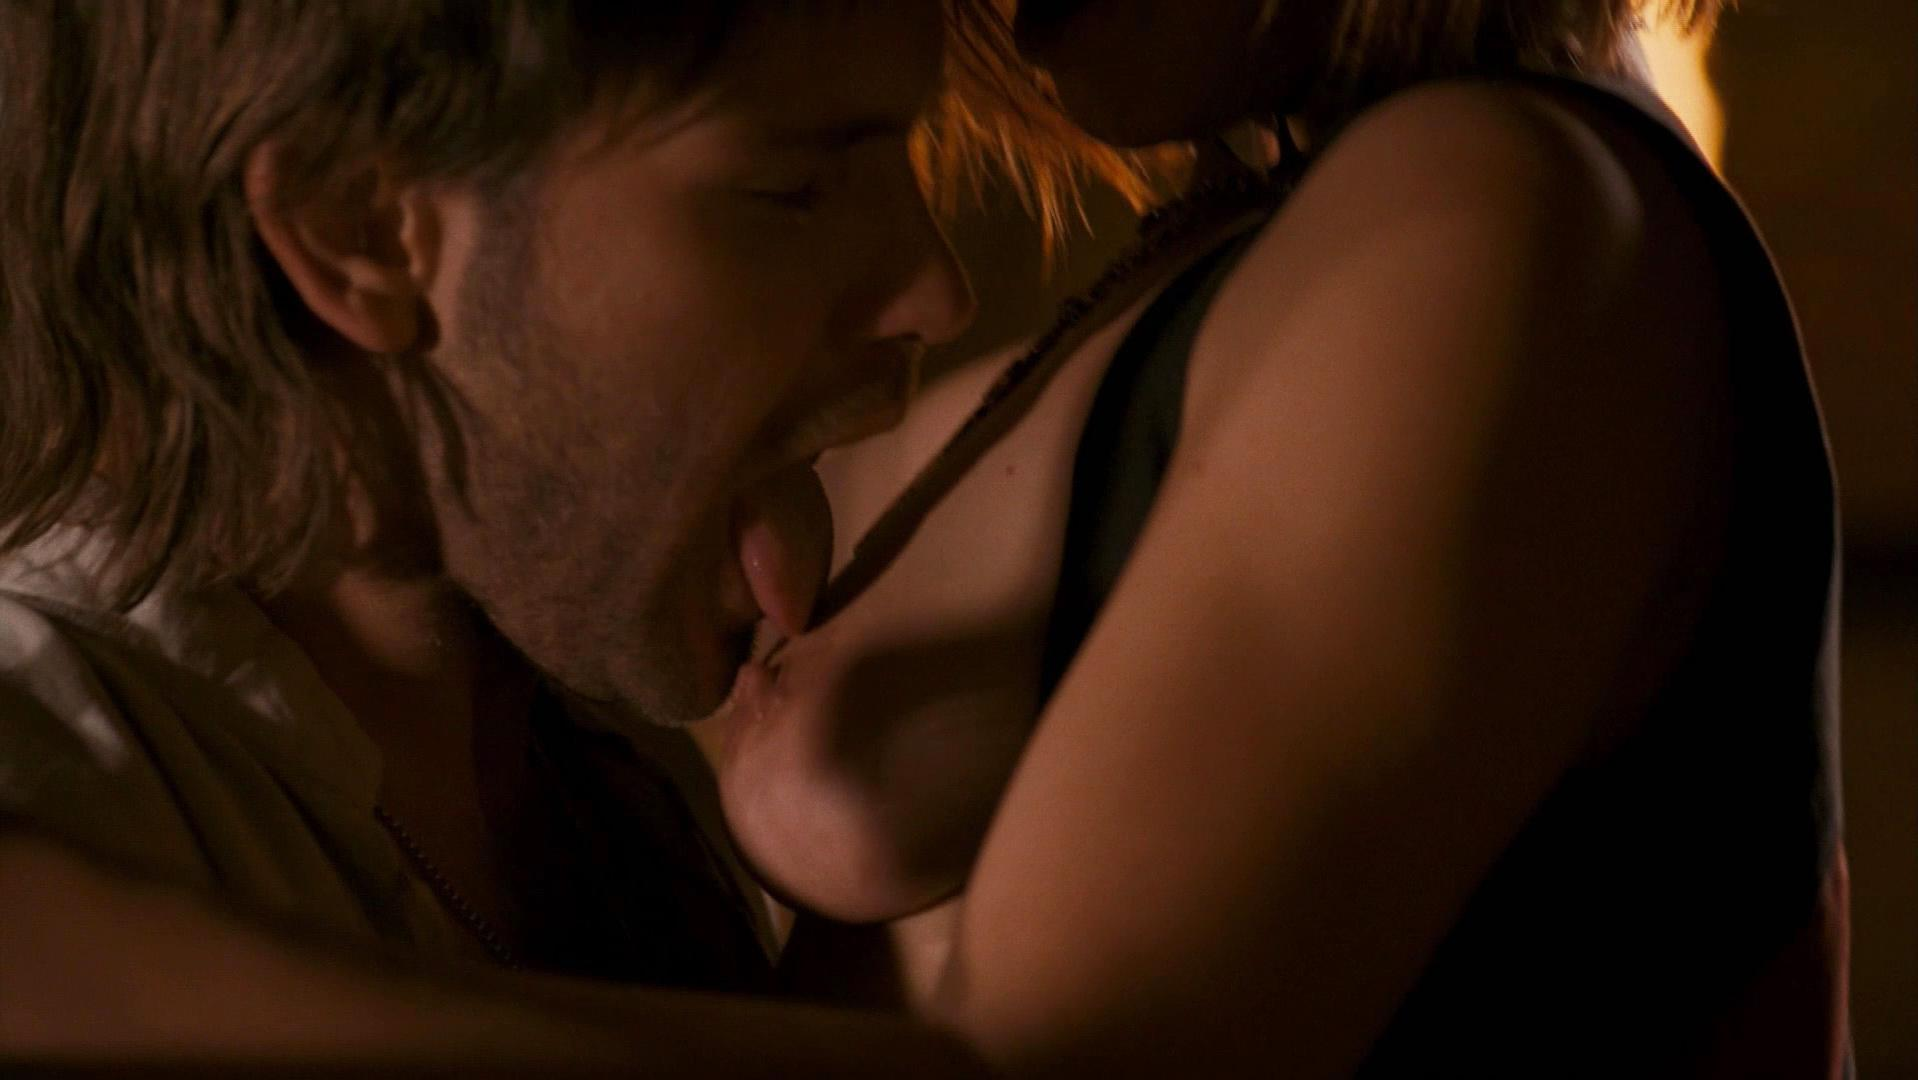 Big boobs sexy ass porn